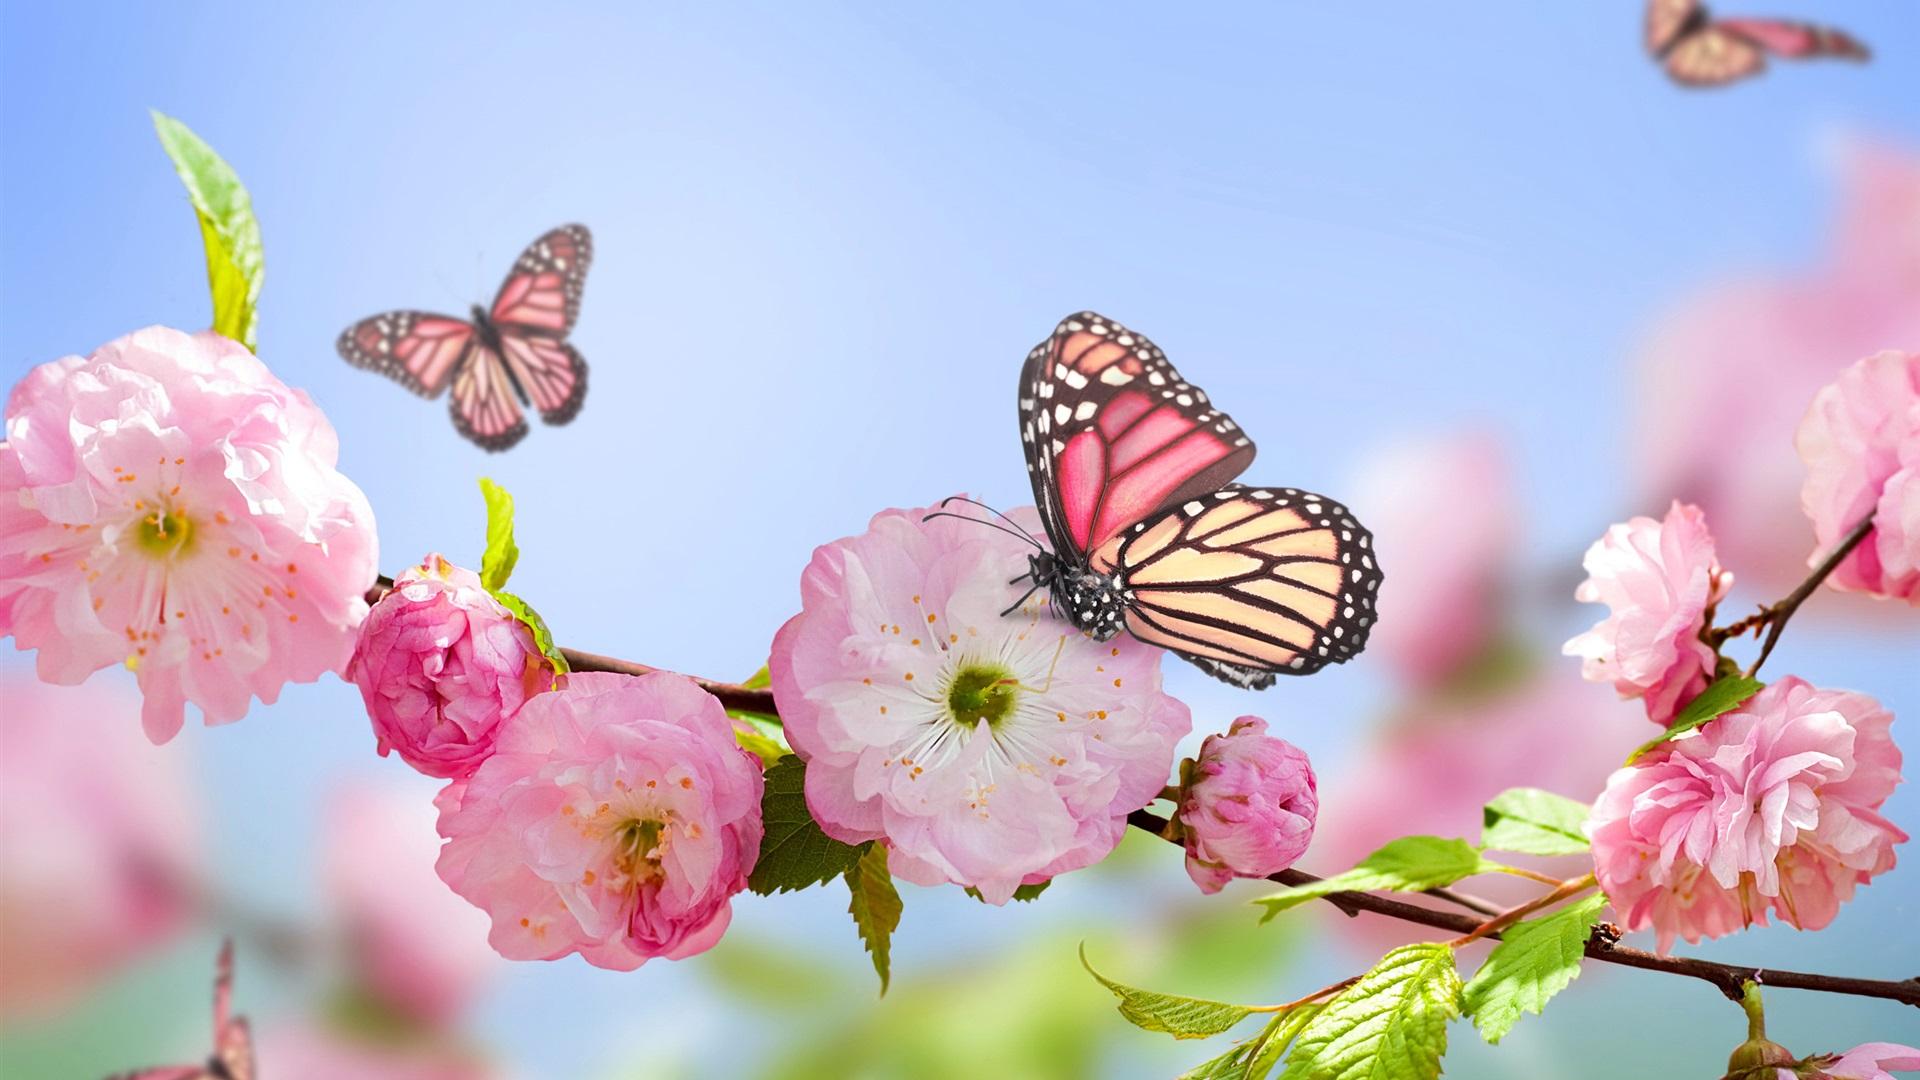 1920x1080 Full HD Hintergrundbilder Printemps, fleurs roses, papillons,  ciel bleu